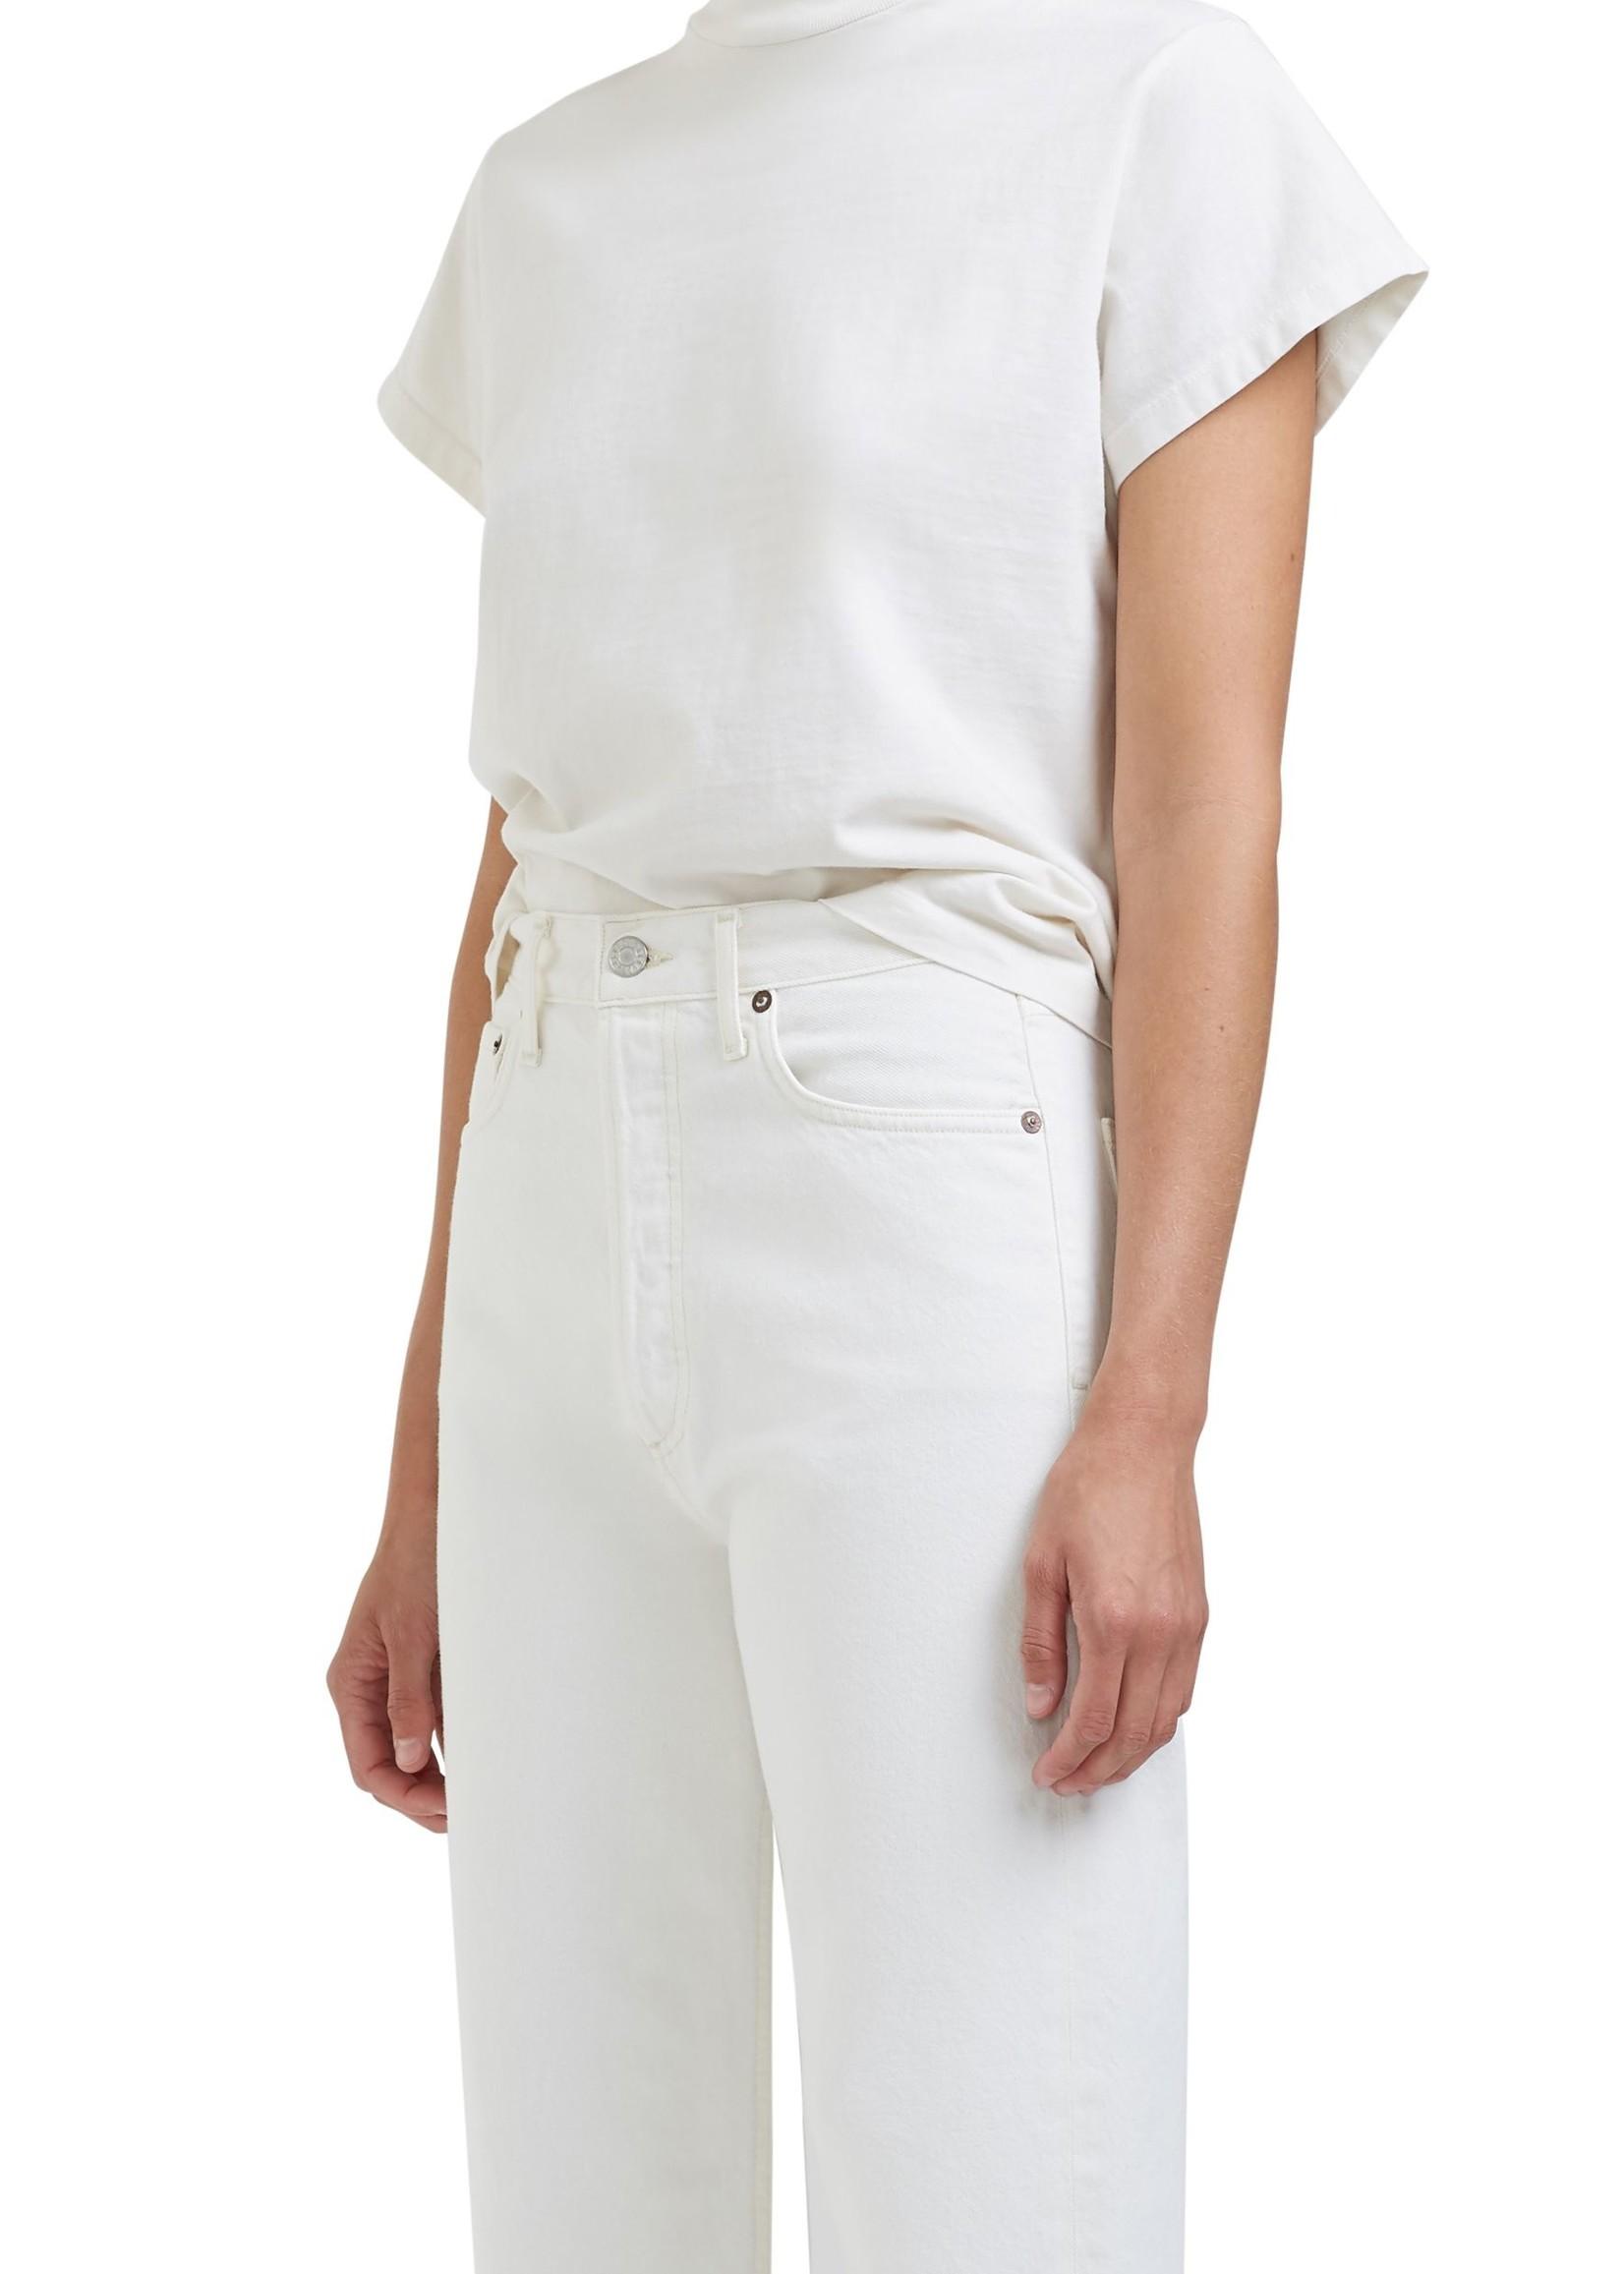 AGOLDE Anika Cap Sleeve T-shirt in White